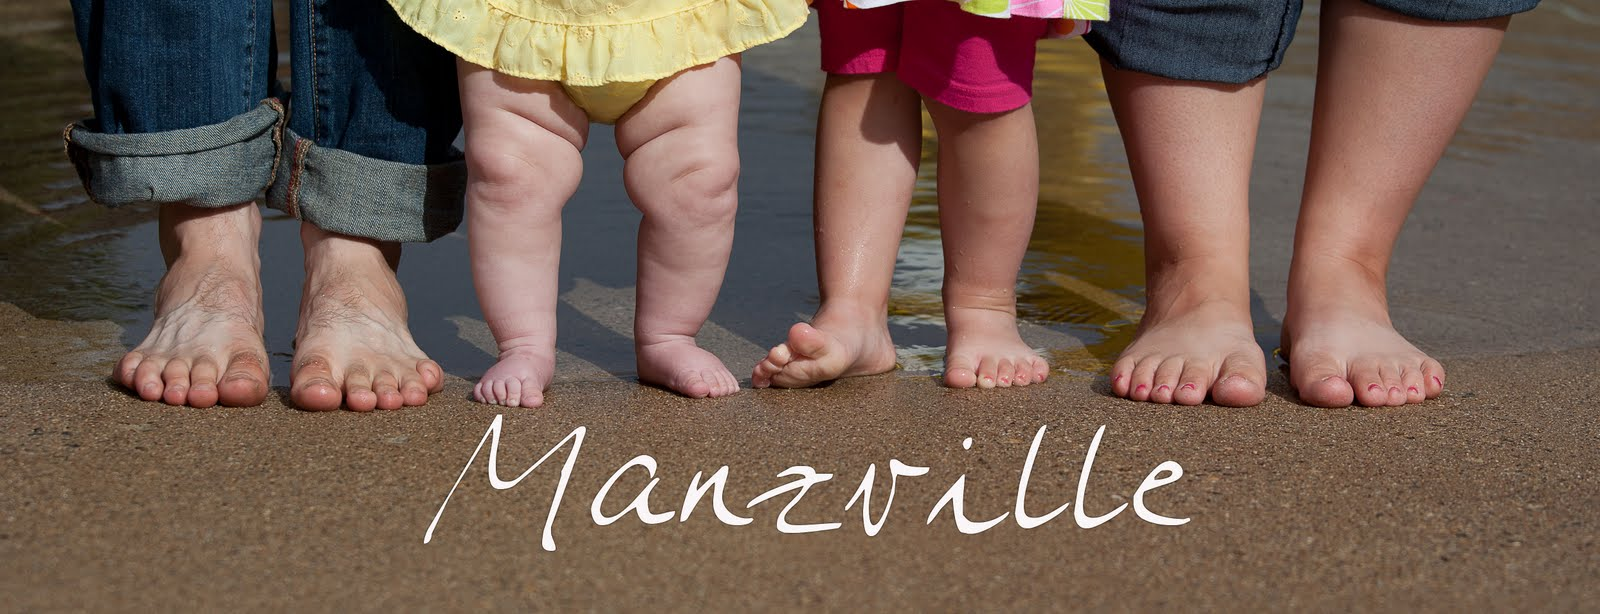 Manzville